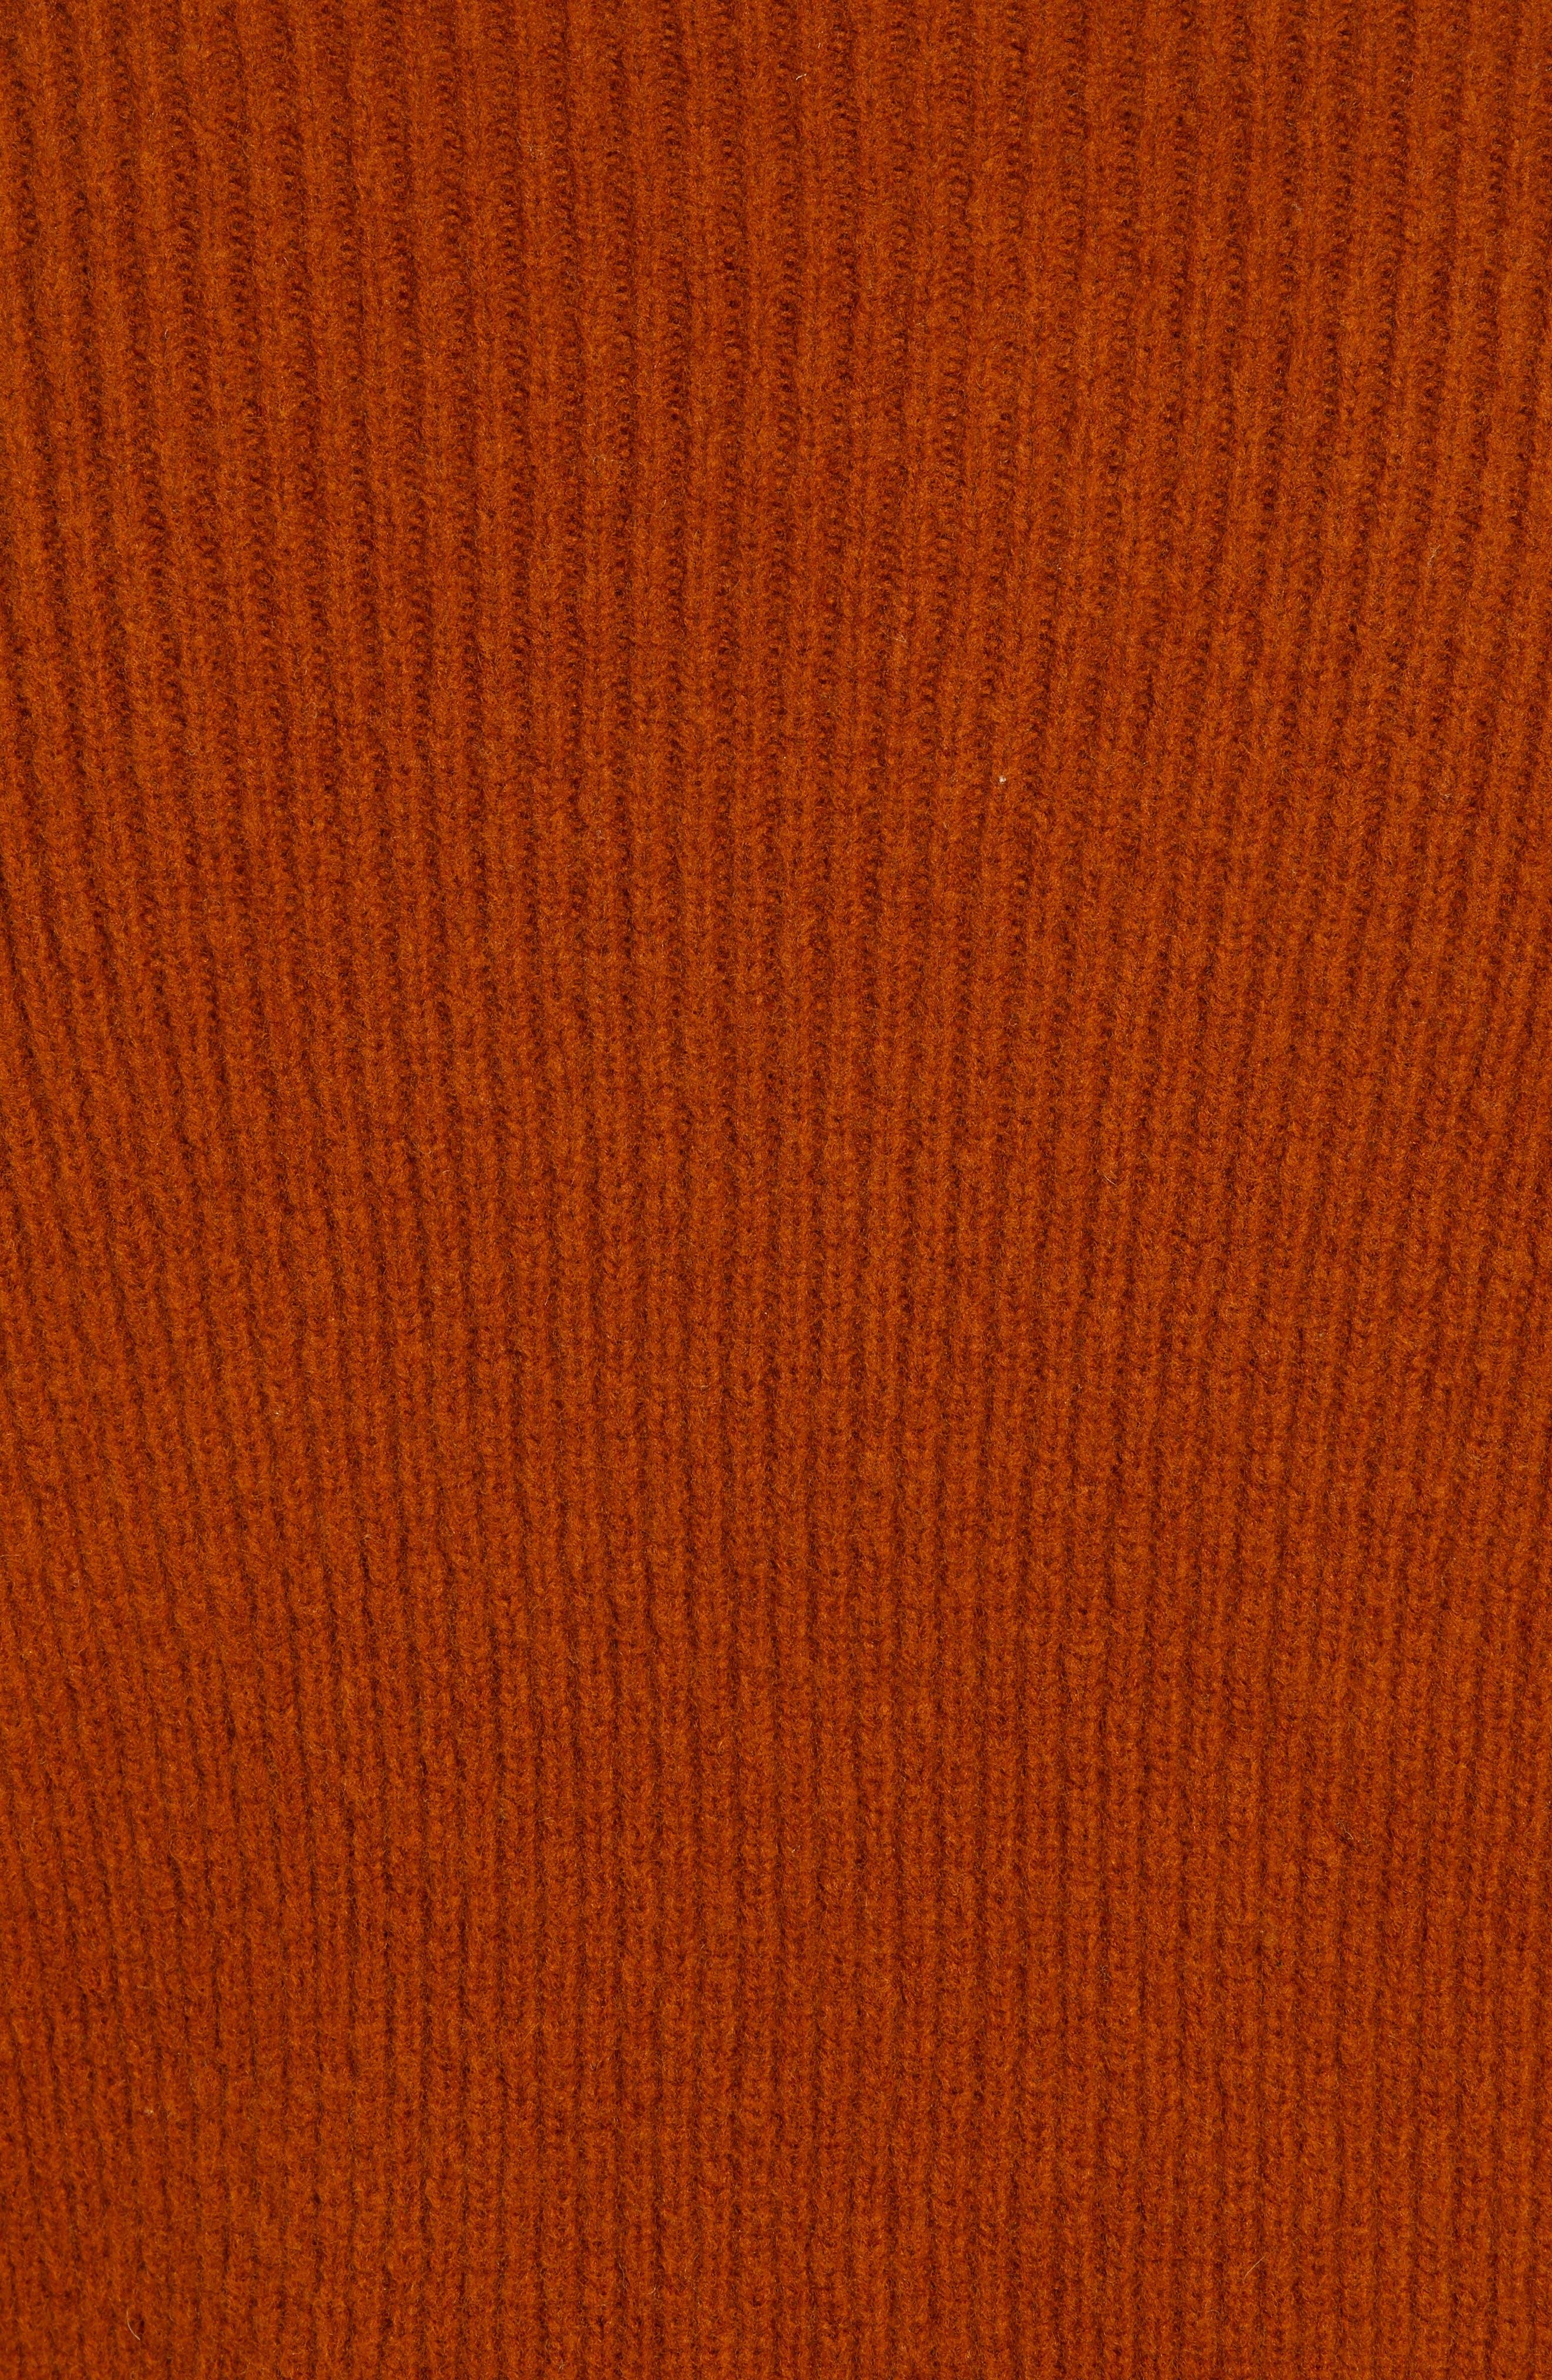 Wool Blend Turtleneck Sweater,                             Alternate thumbnail 5, color,                             RUSSET BROWN